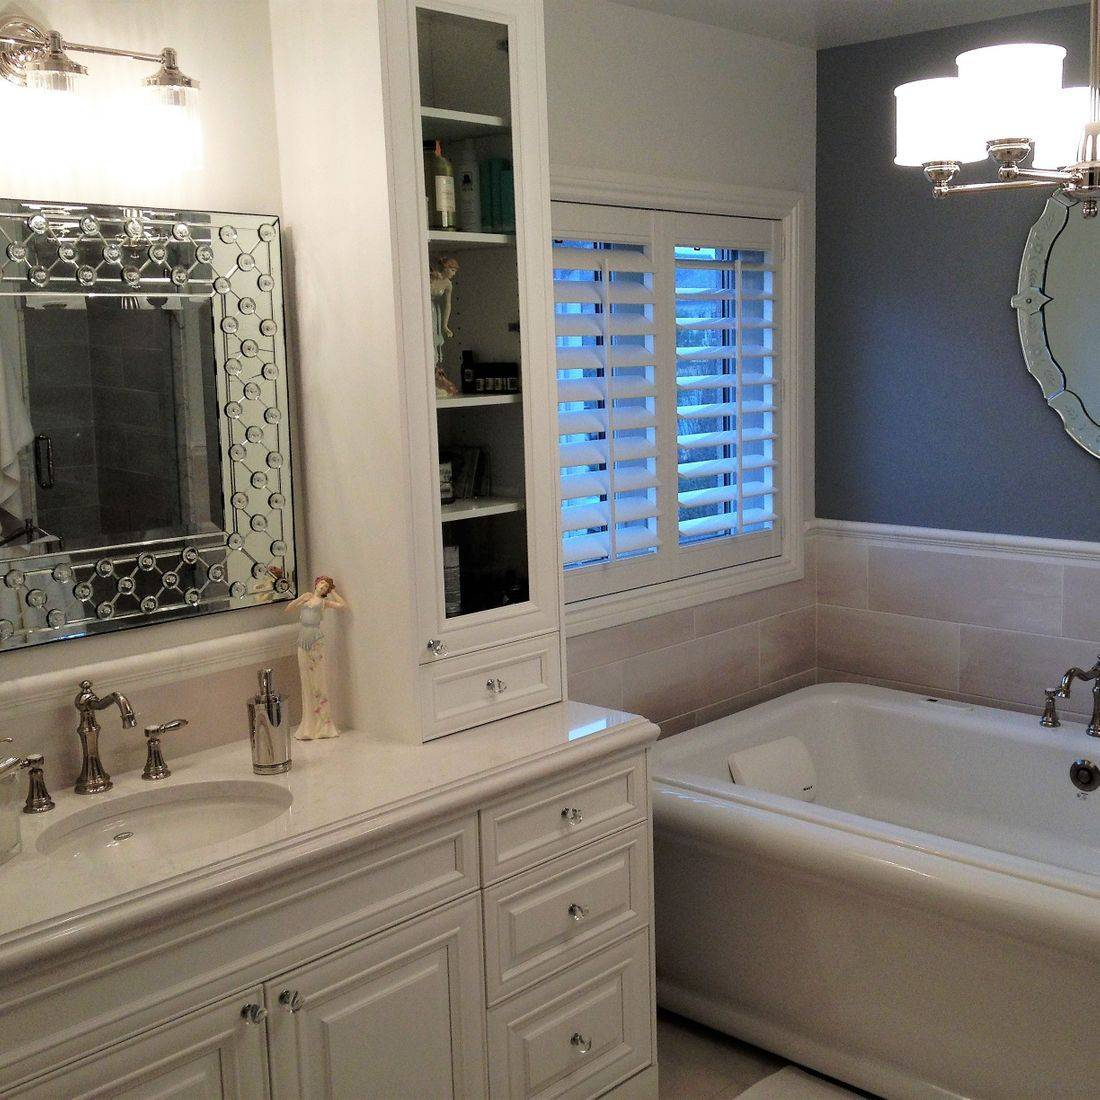 Sibra Kitchens Markham Toronto cambria quartz cabinets bathroom vanity soaker tub